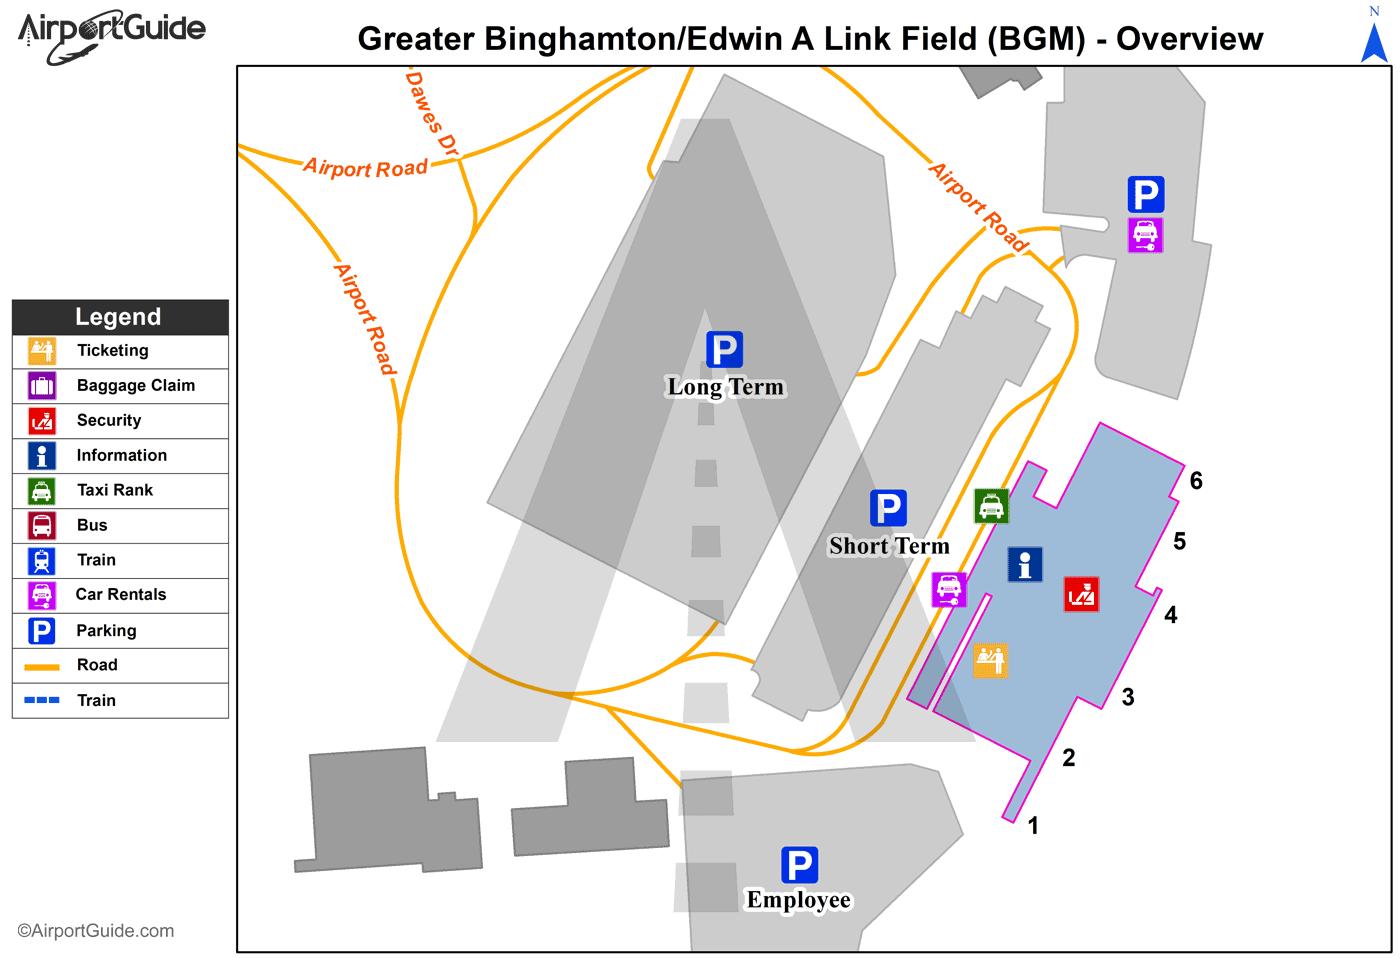 Binghamton - Greater Binghamton/Edwin A Link Field (BGM) Airport ...